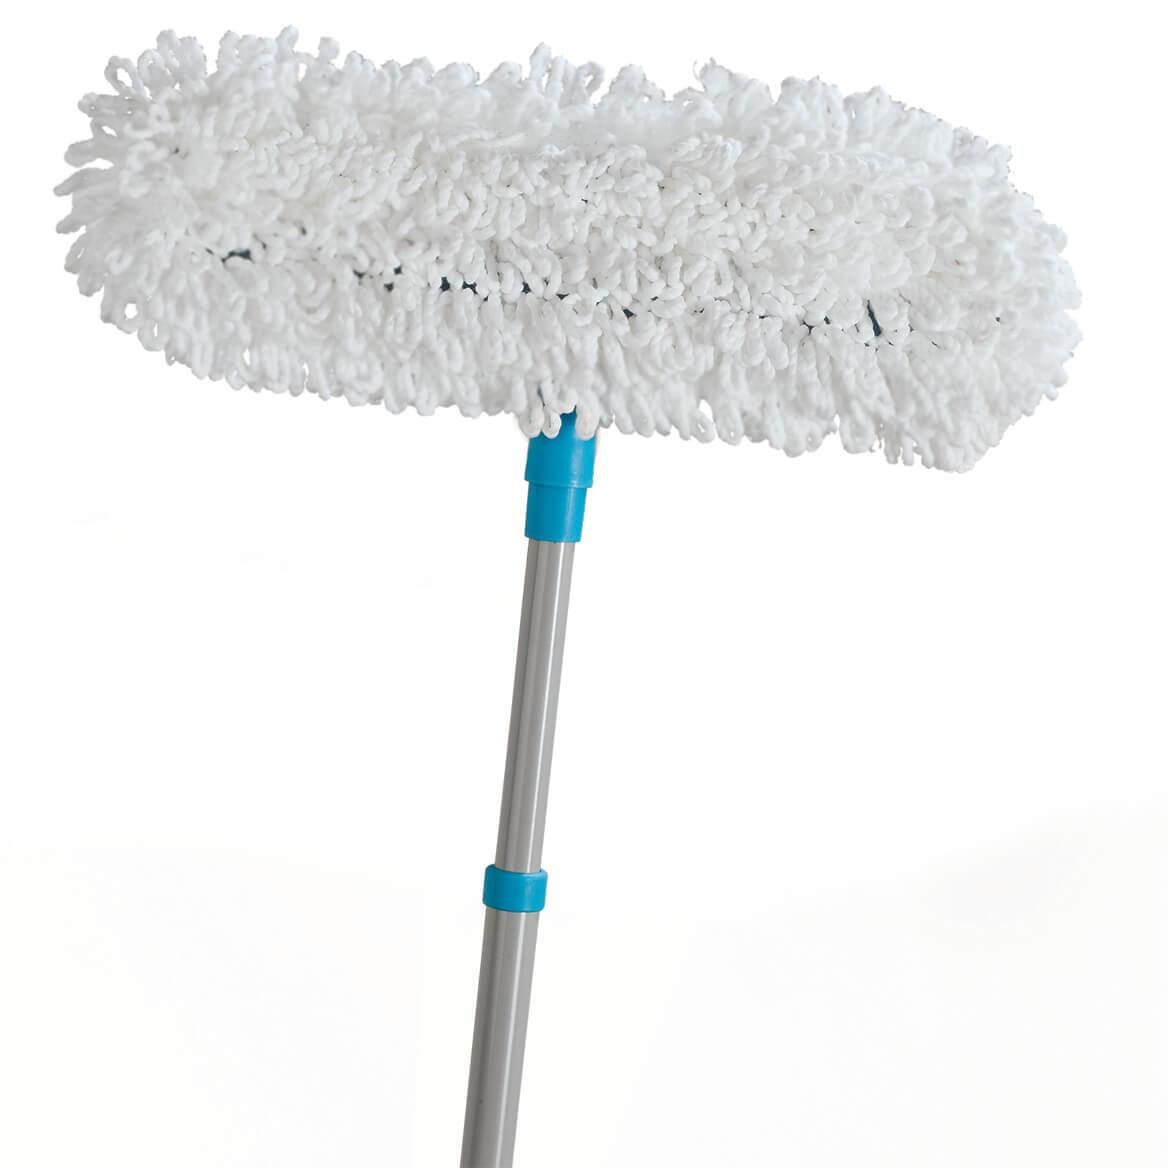 Microfiber Flexible Mop Replacement Pad